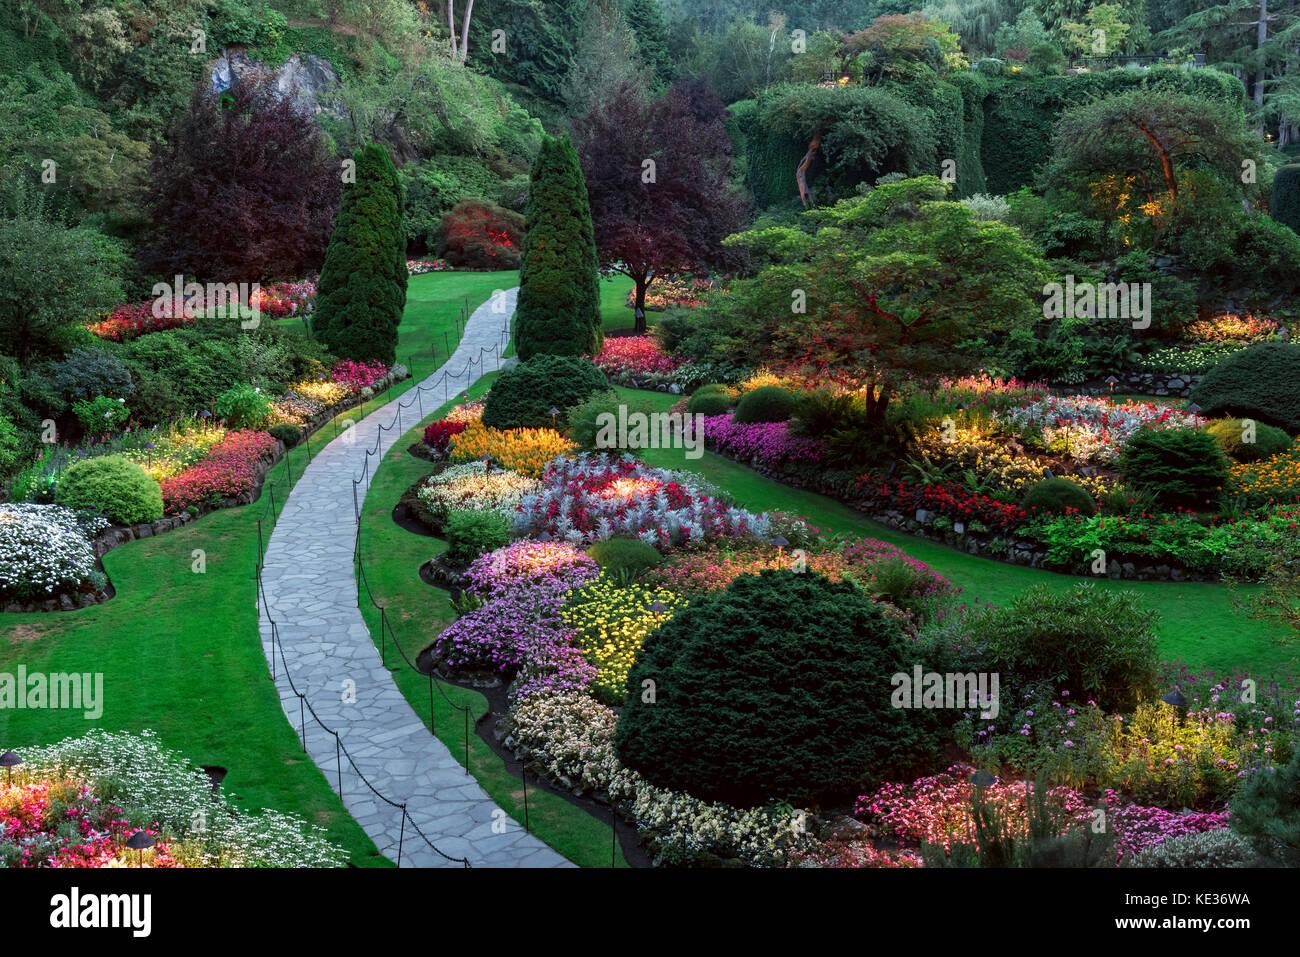 Sunken Garden Stock Photos Sunken Garden Stock Images Alamy